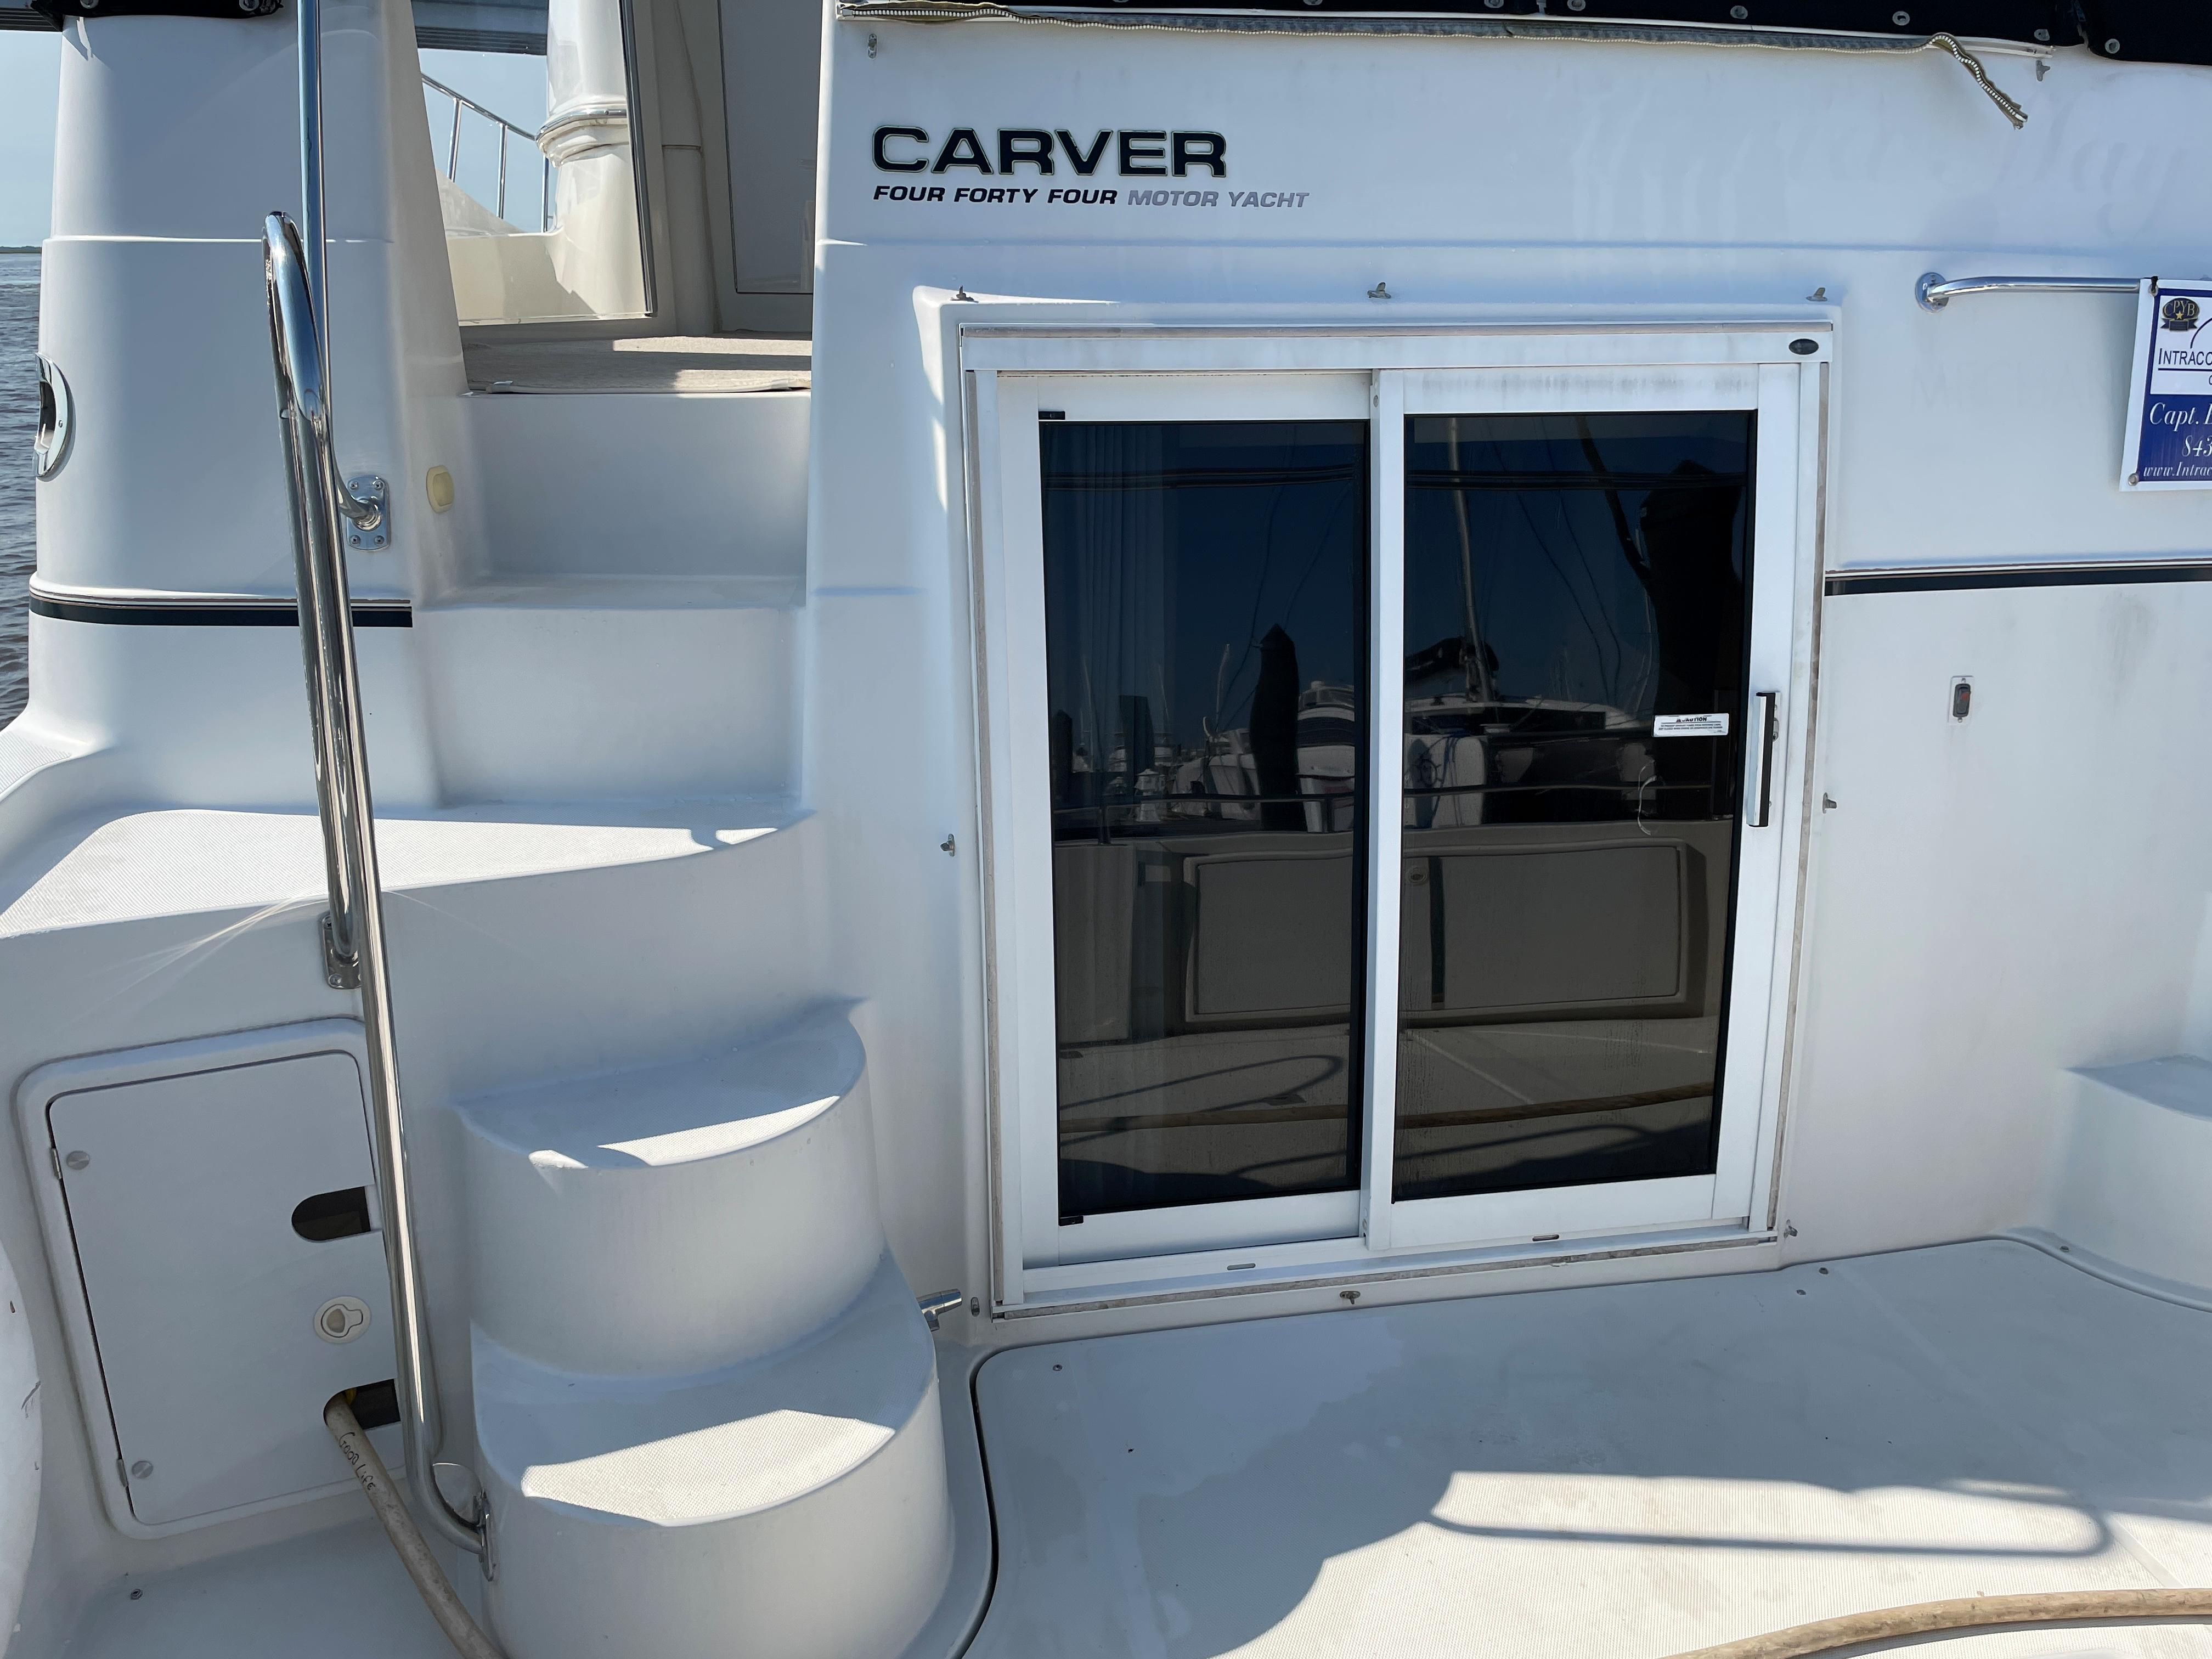 Carver 444 Cockpit Motor Yacht - Cockpit/Entryway to MSR